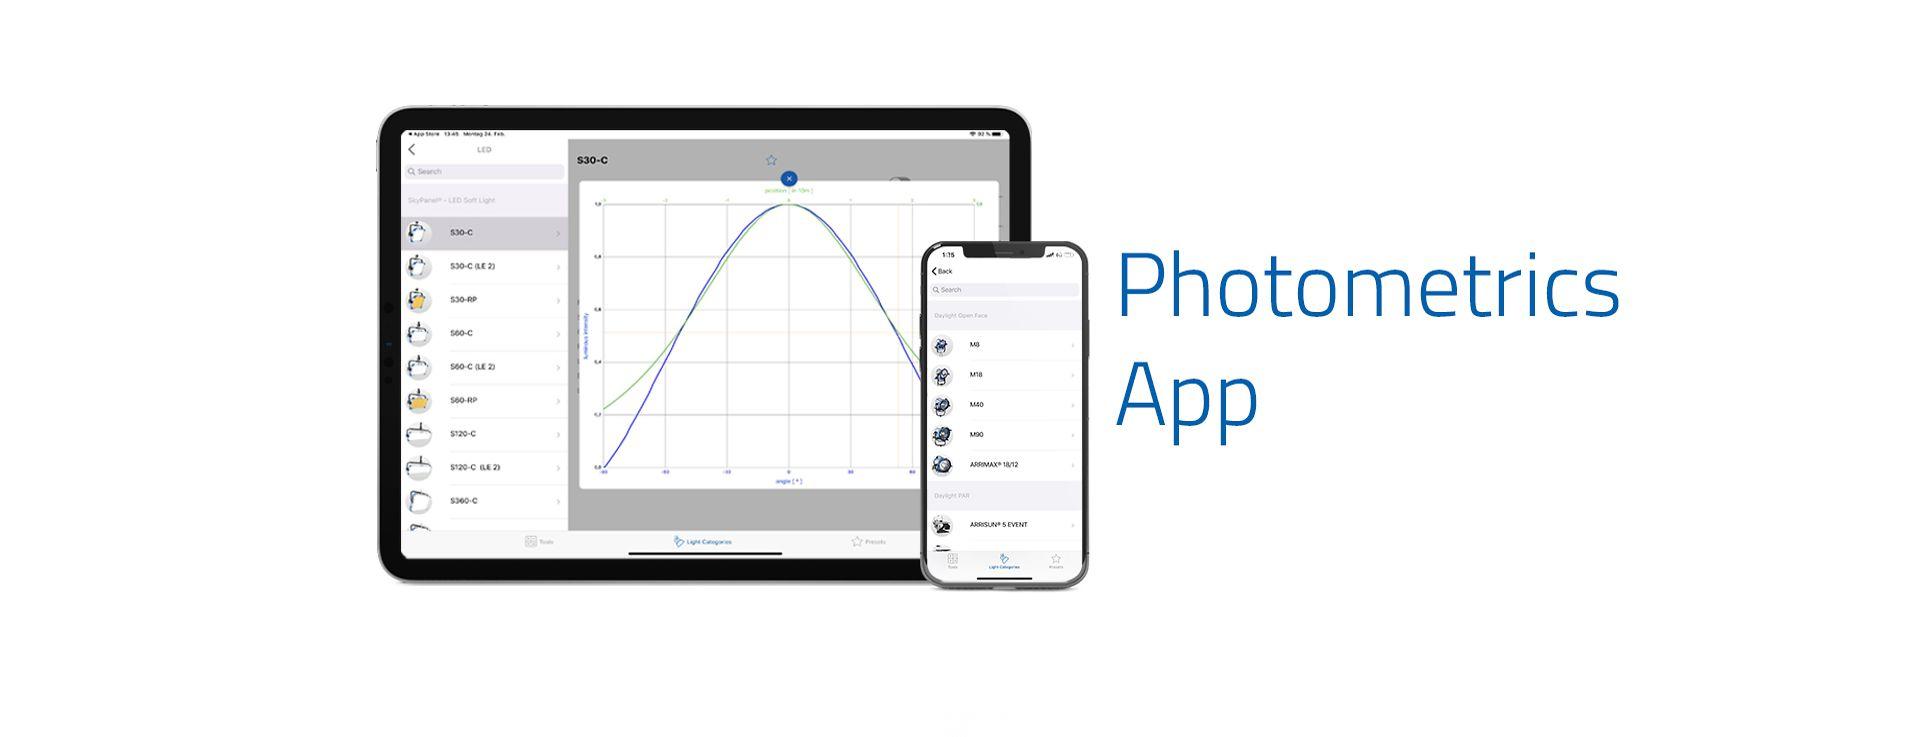 arri-photometrics-app